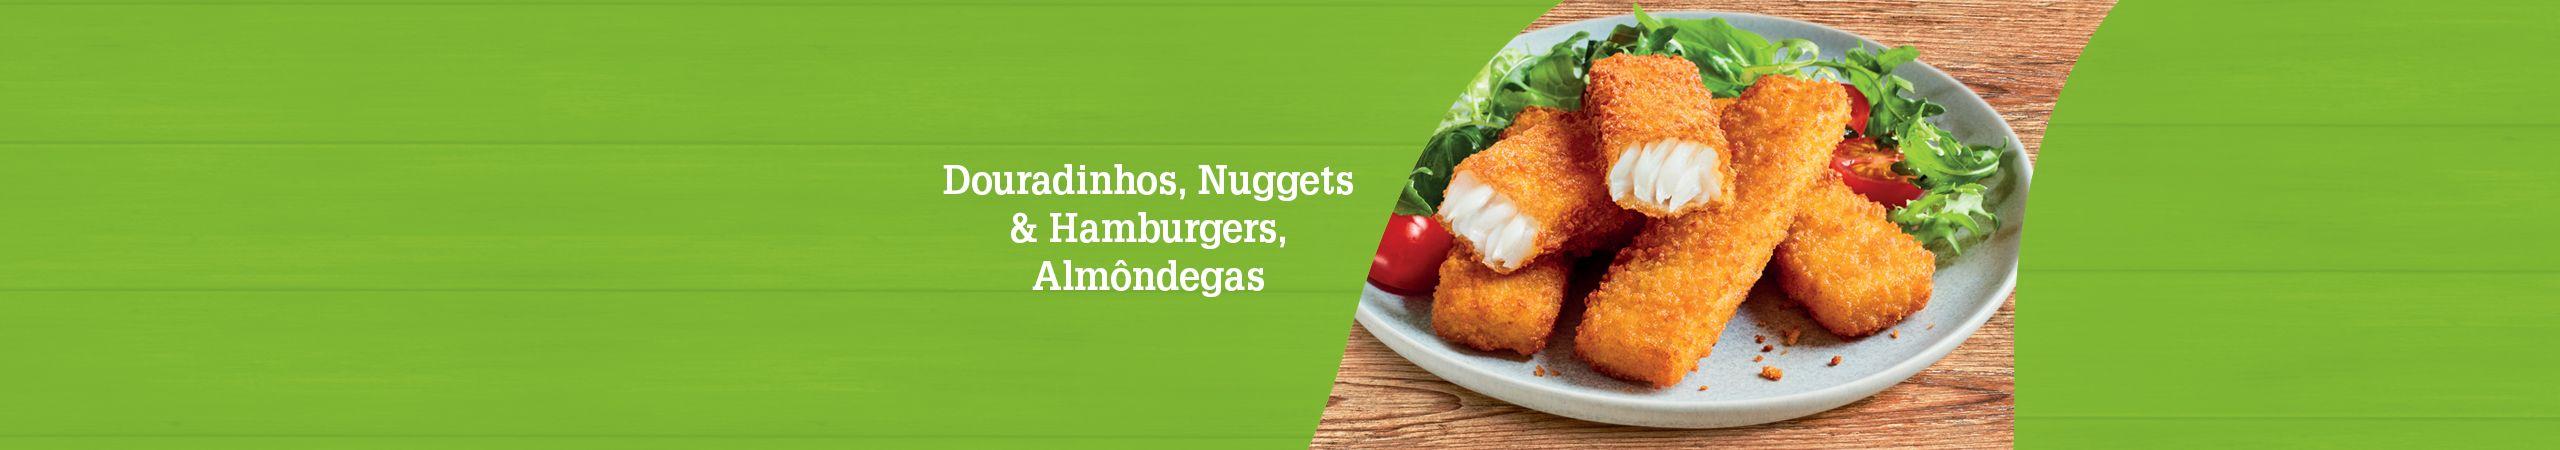 Douradinhos, Nuggets, Hambugers e Almôndegas Iglo